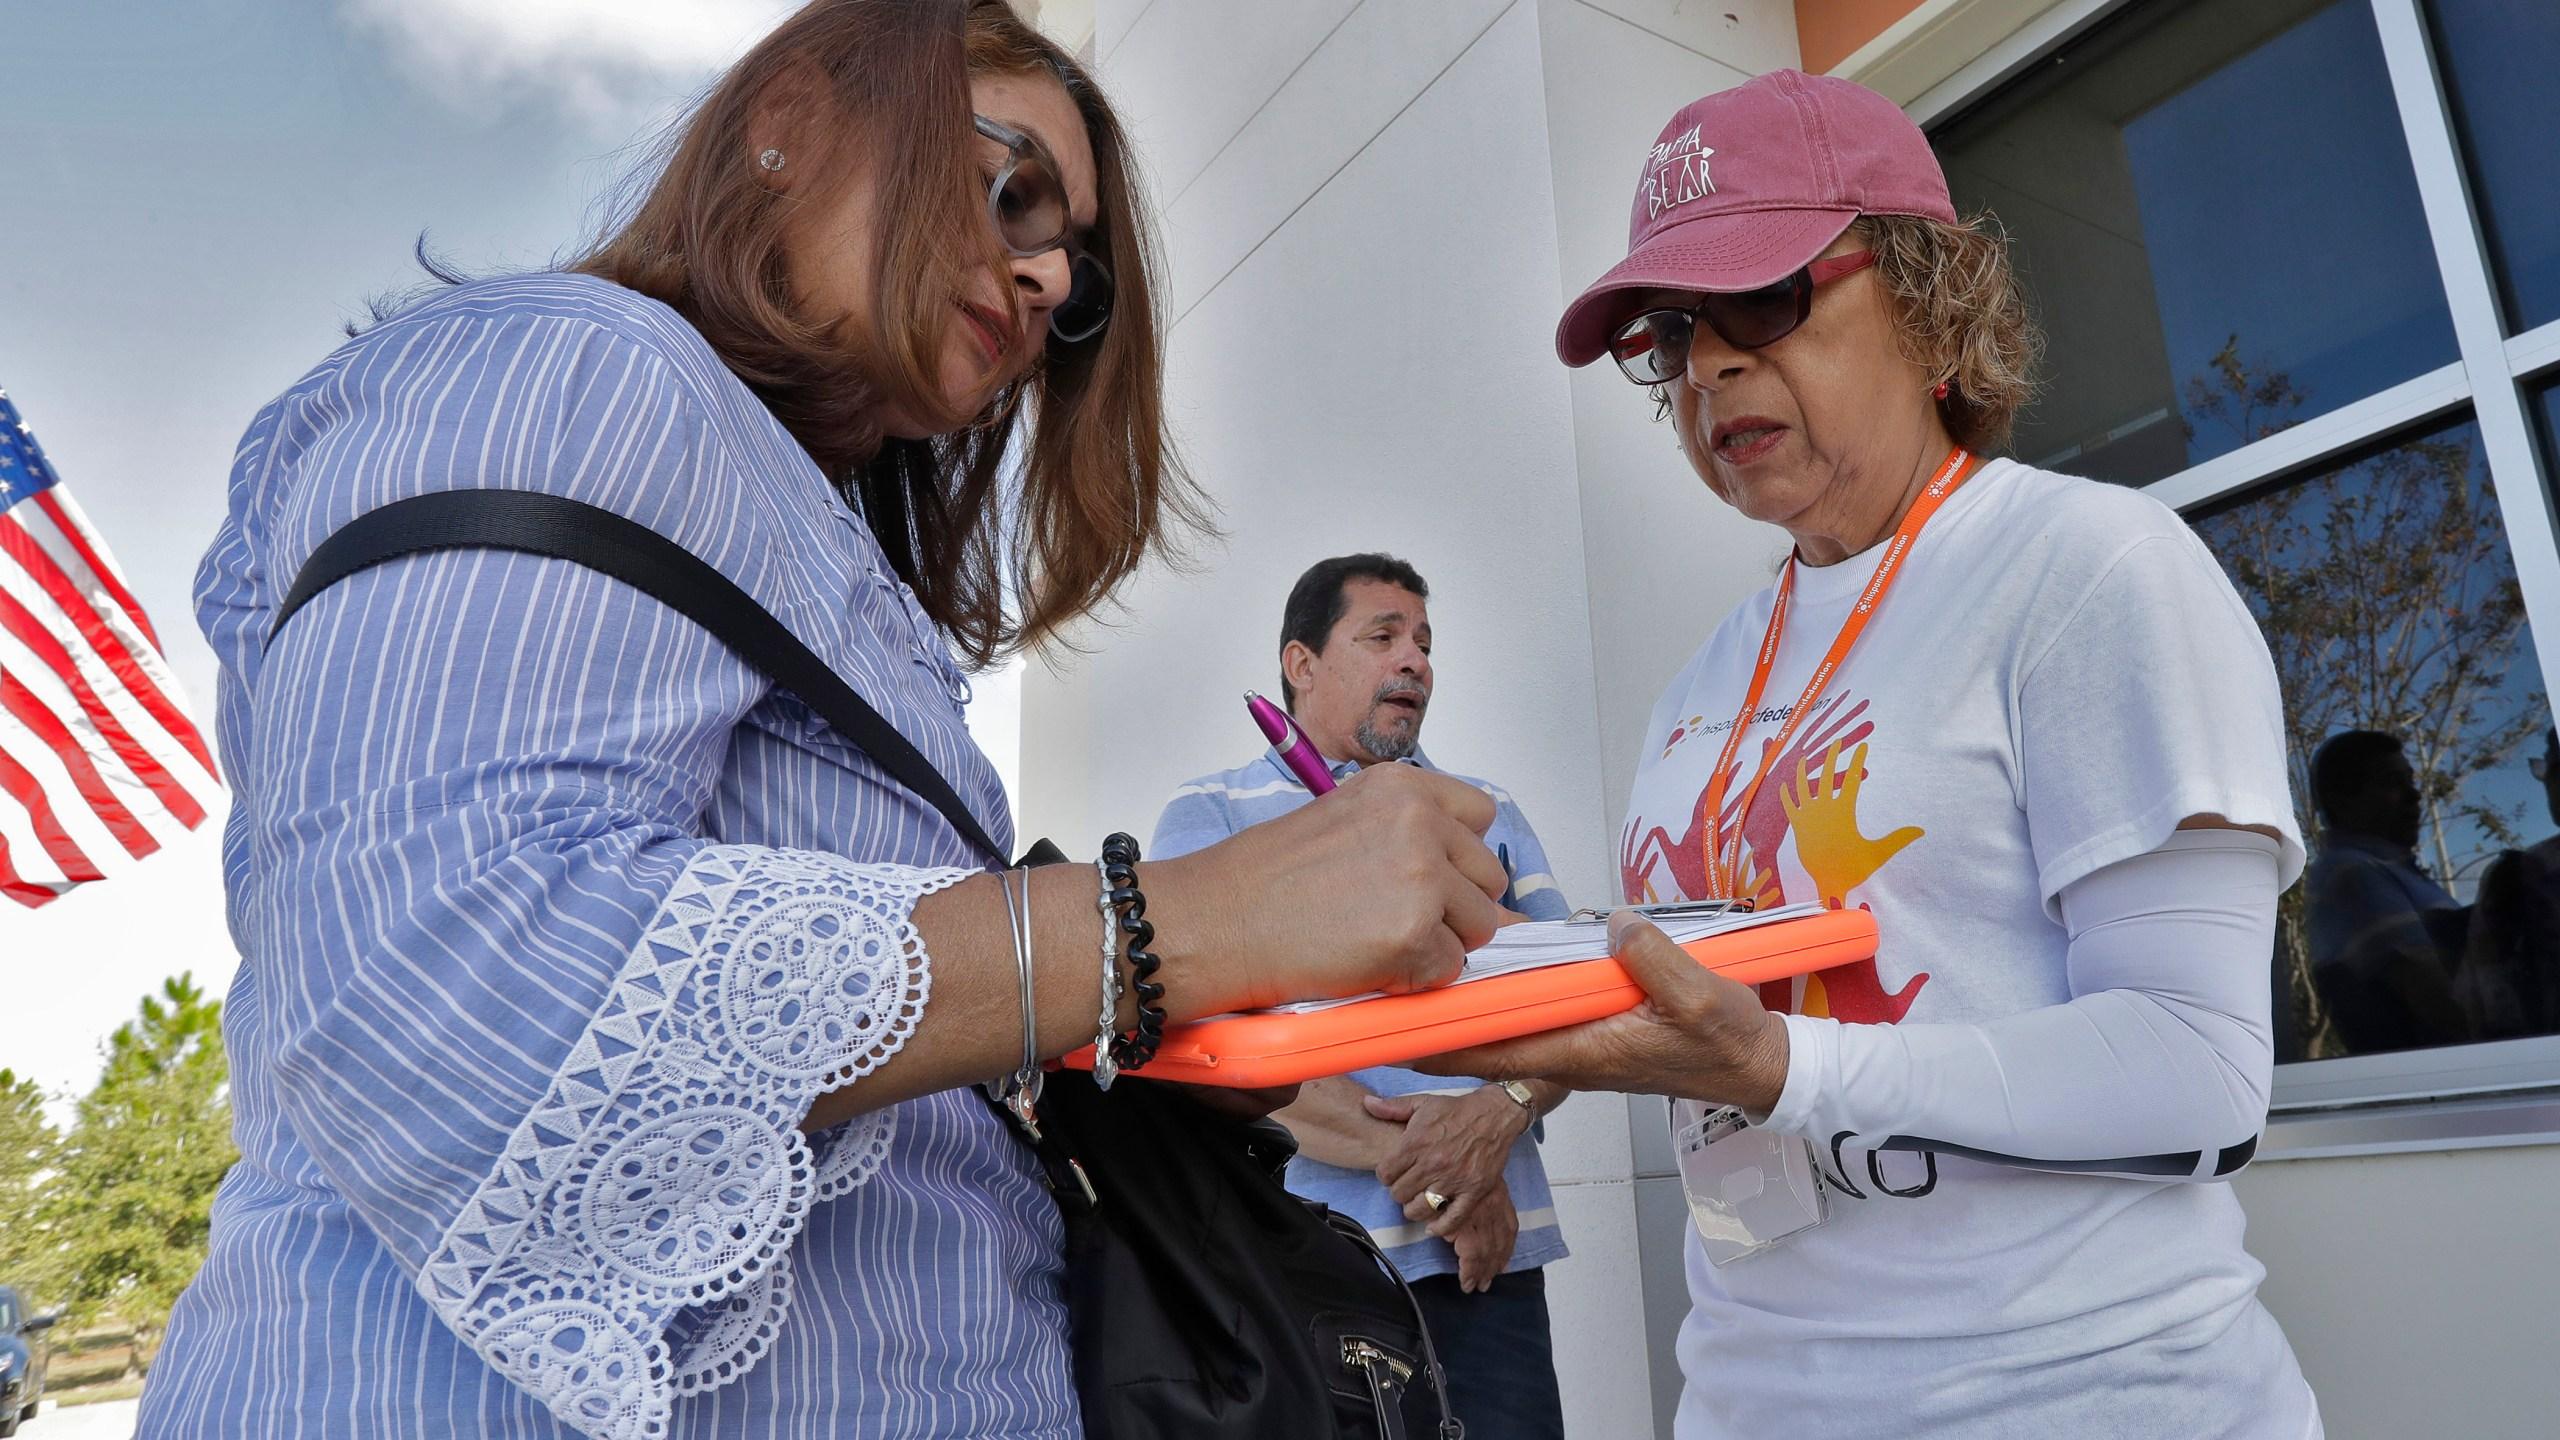 Ana Vigo, Maria Morales, Ivan Baez Munoz